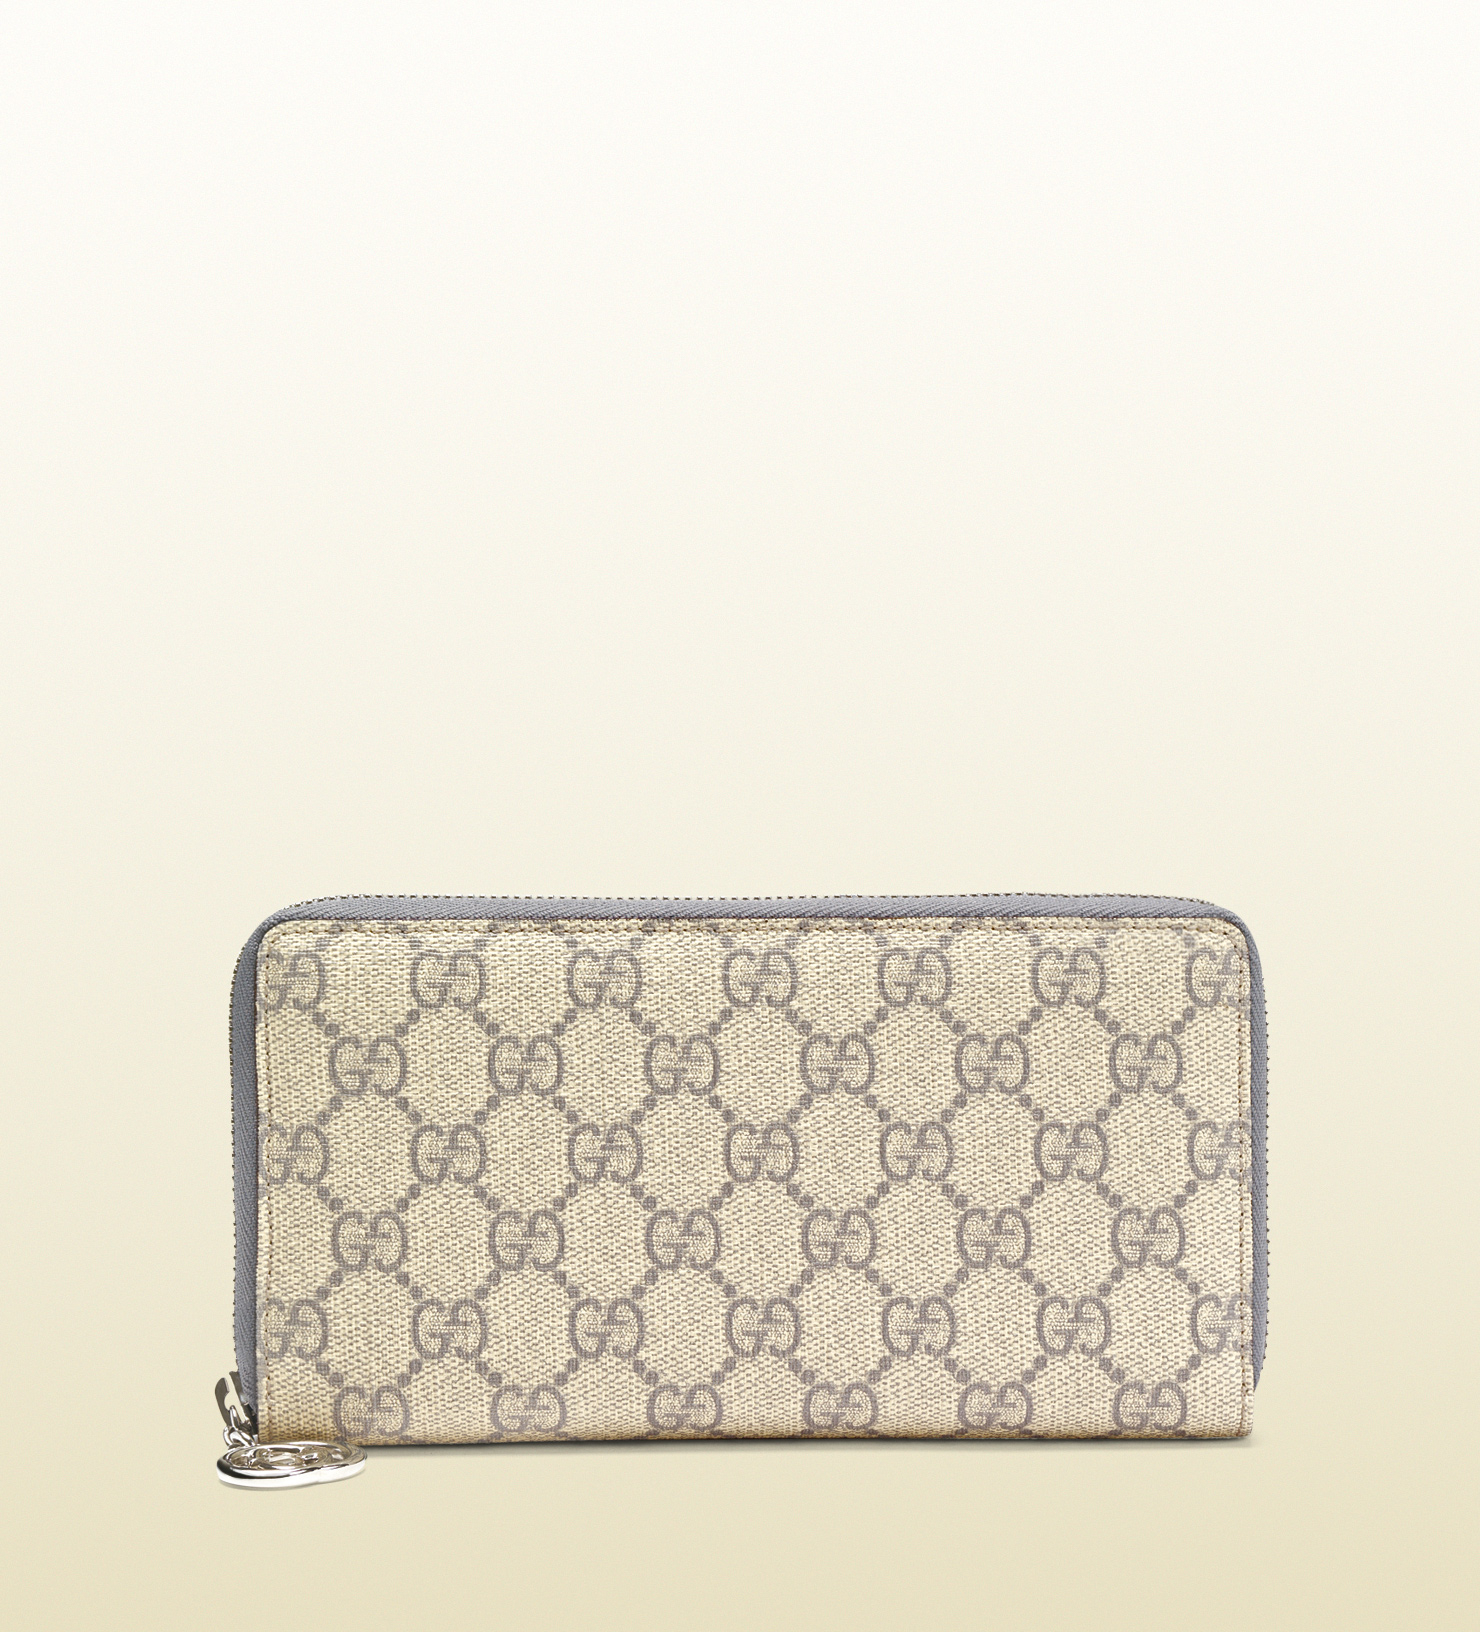 745087981685 Gucci Gg Supreme Canvas Zip Around Wallet in Gray for Men - Lyst